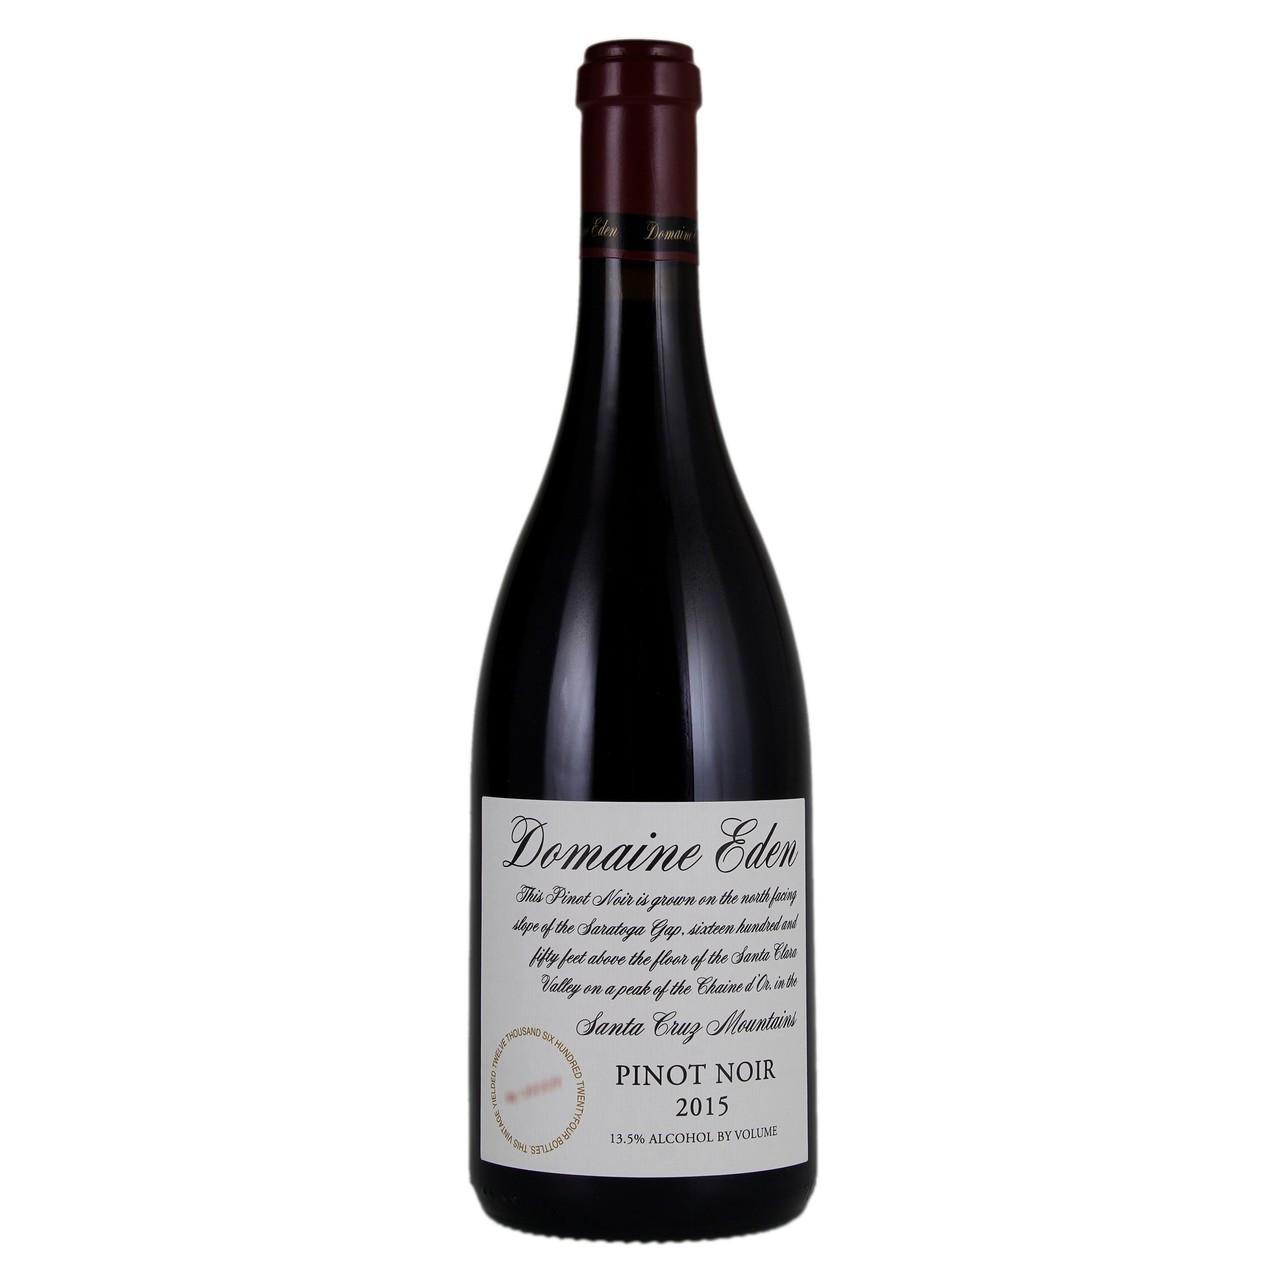 Domaine Eden, Pinot Noir 2015